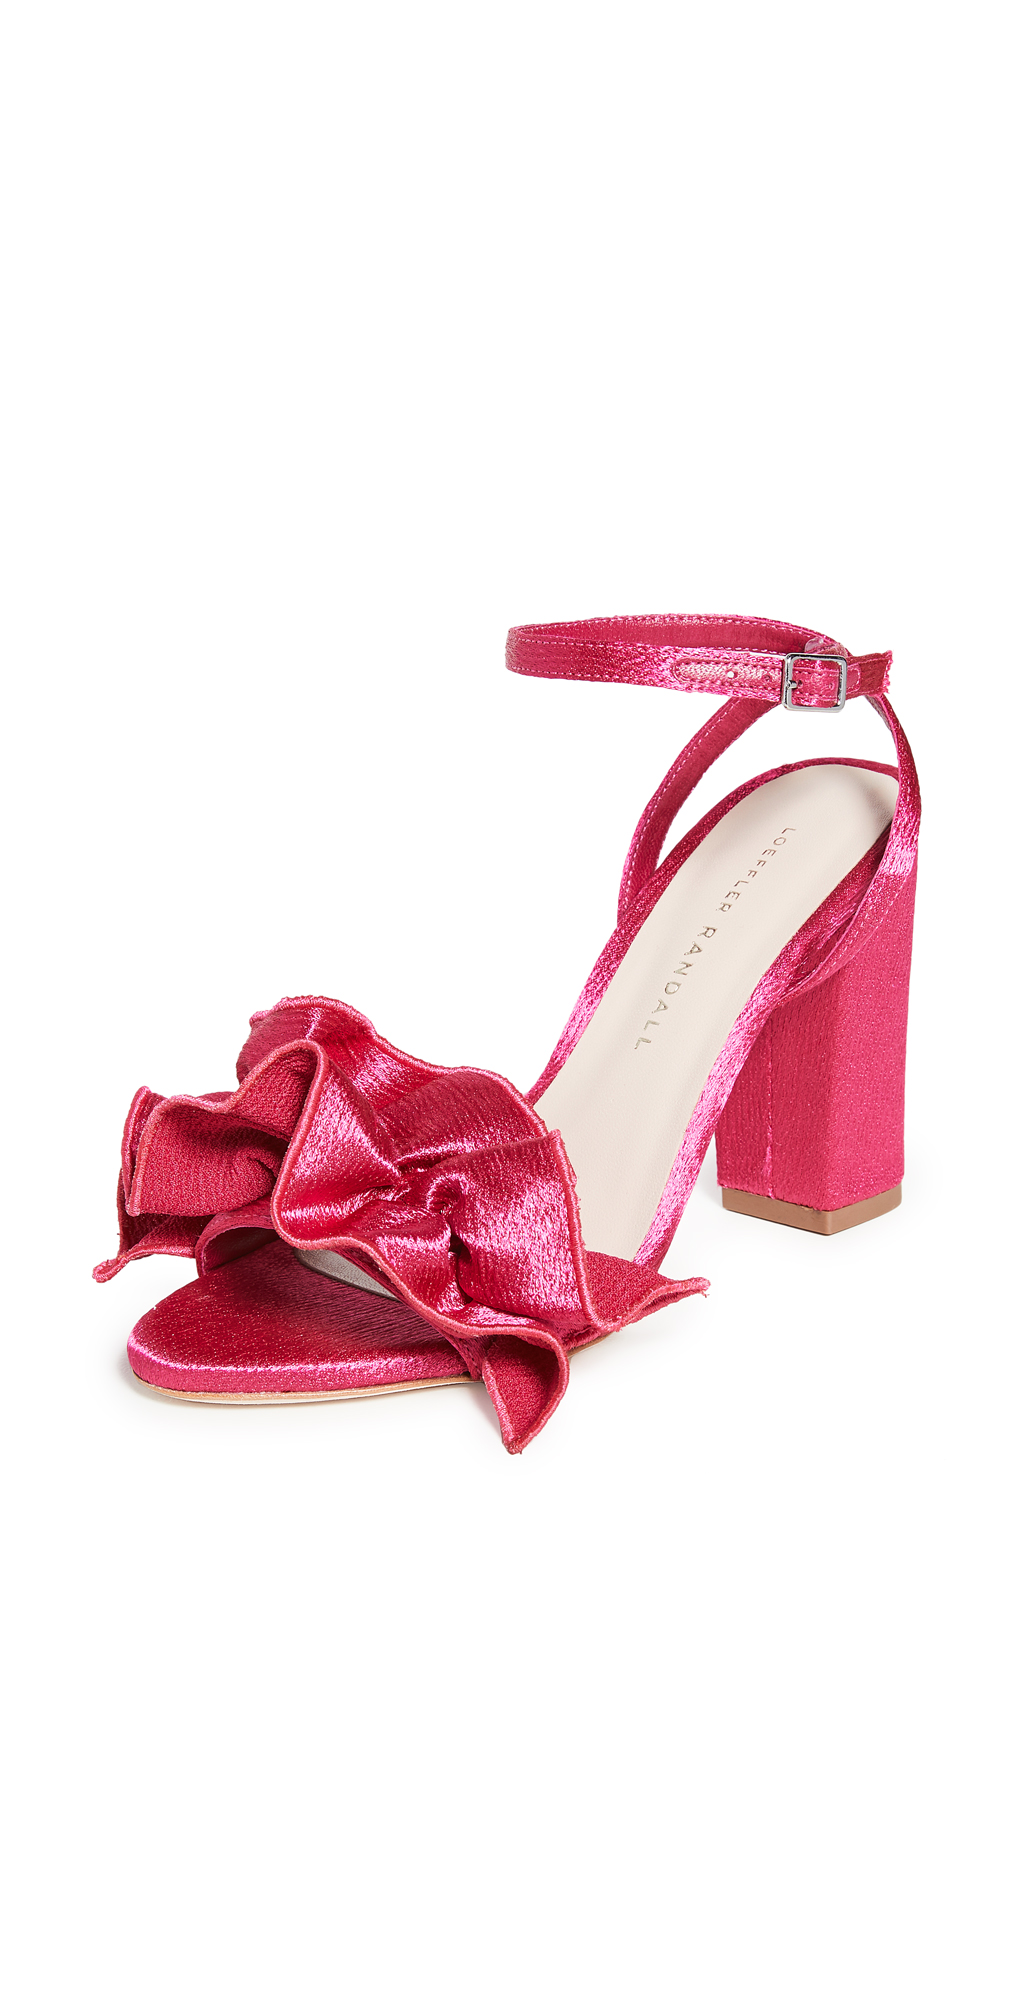 Loeffler Randall Savannah Heel Sandals